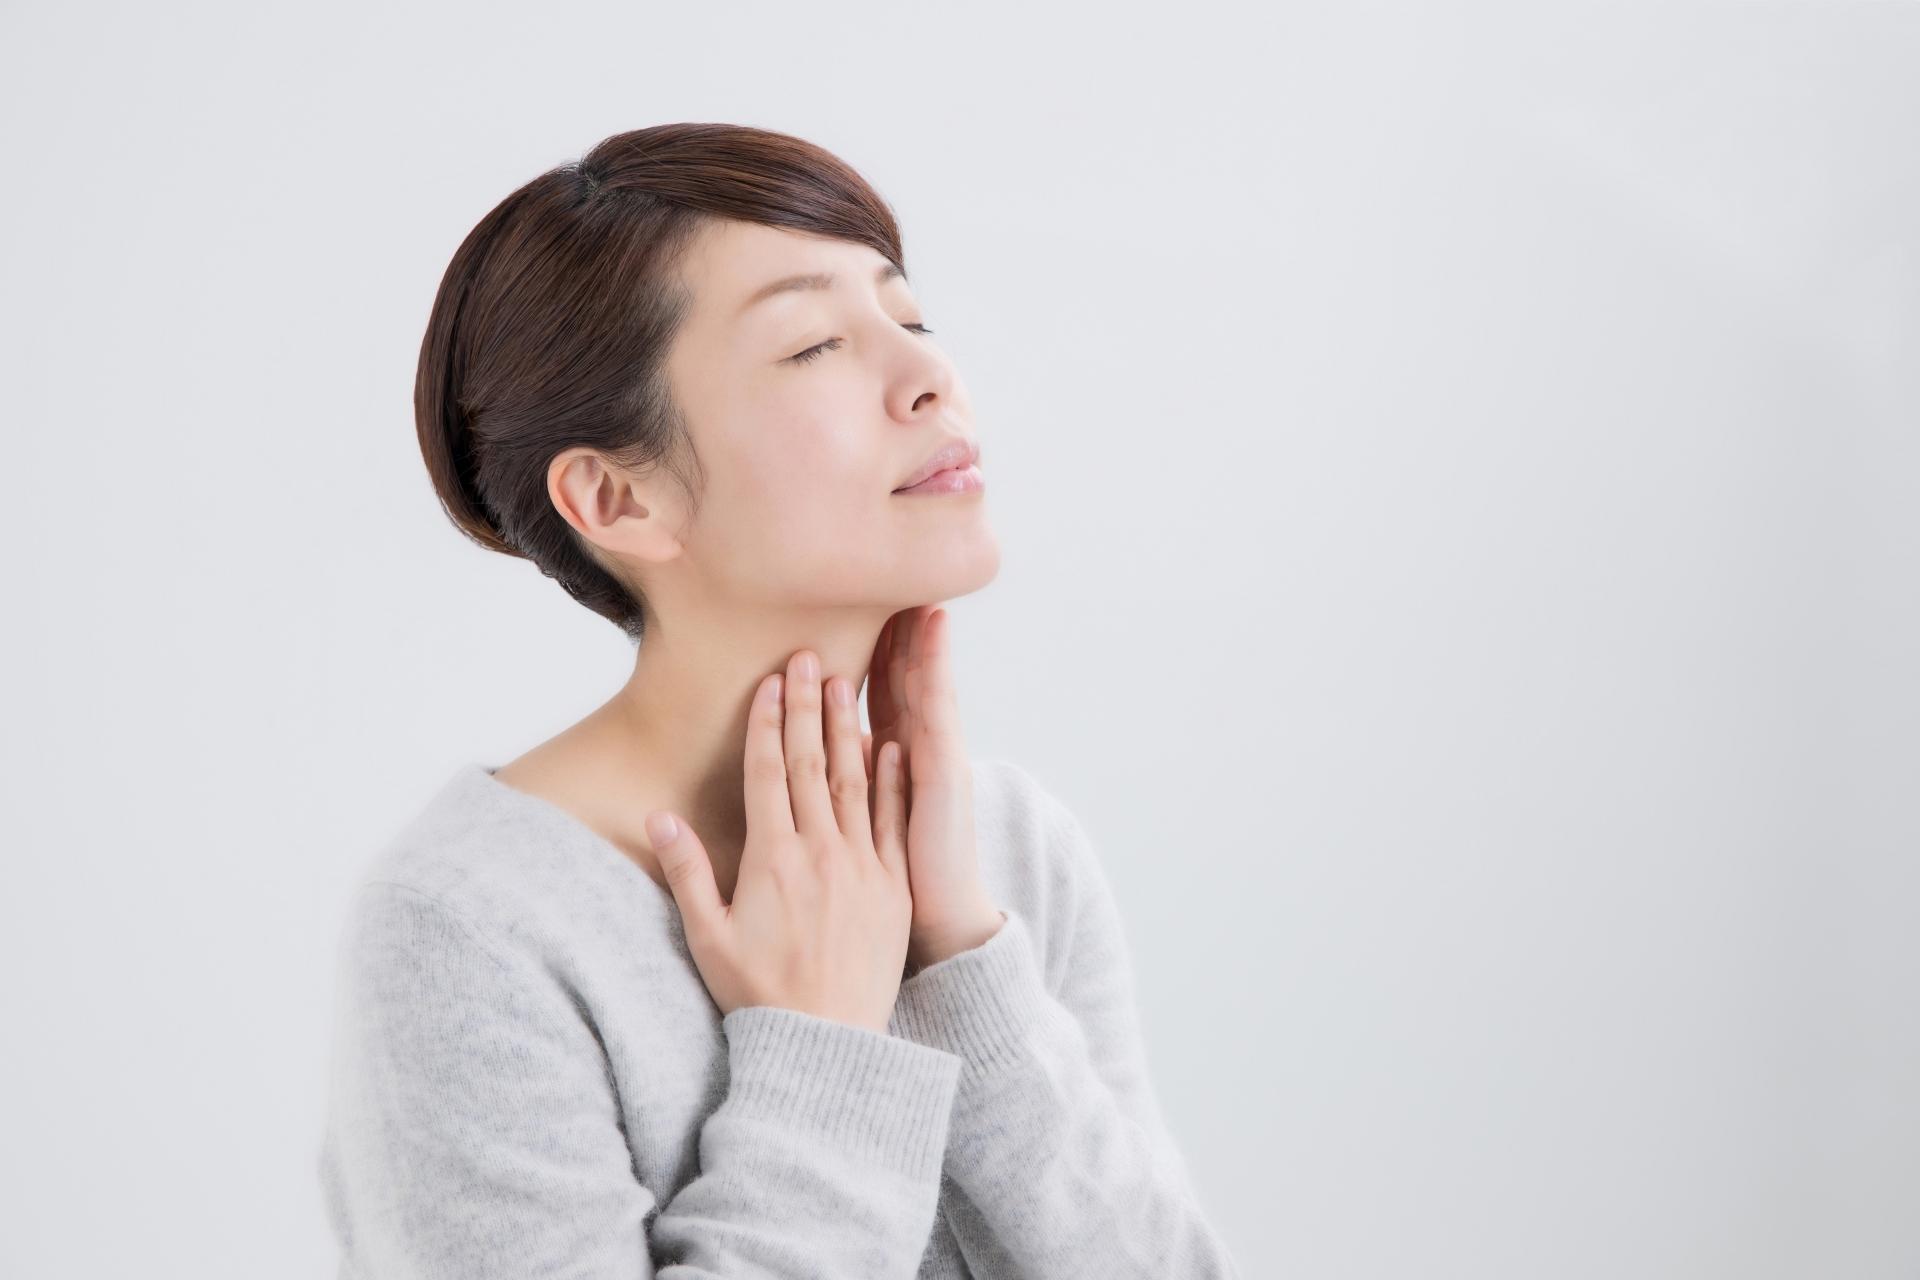 ツボ 胸郭 出口 症候群